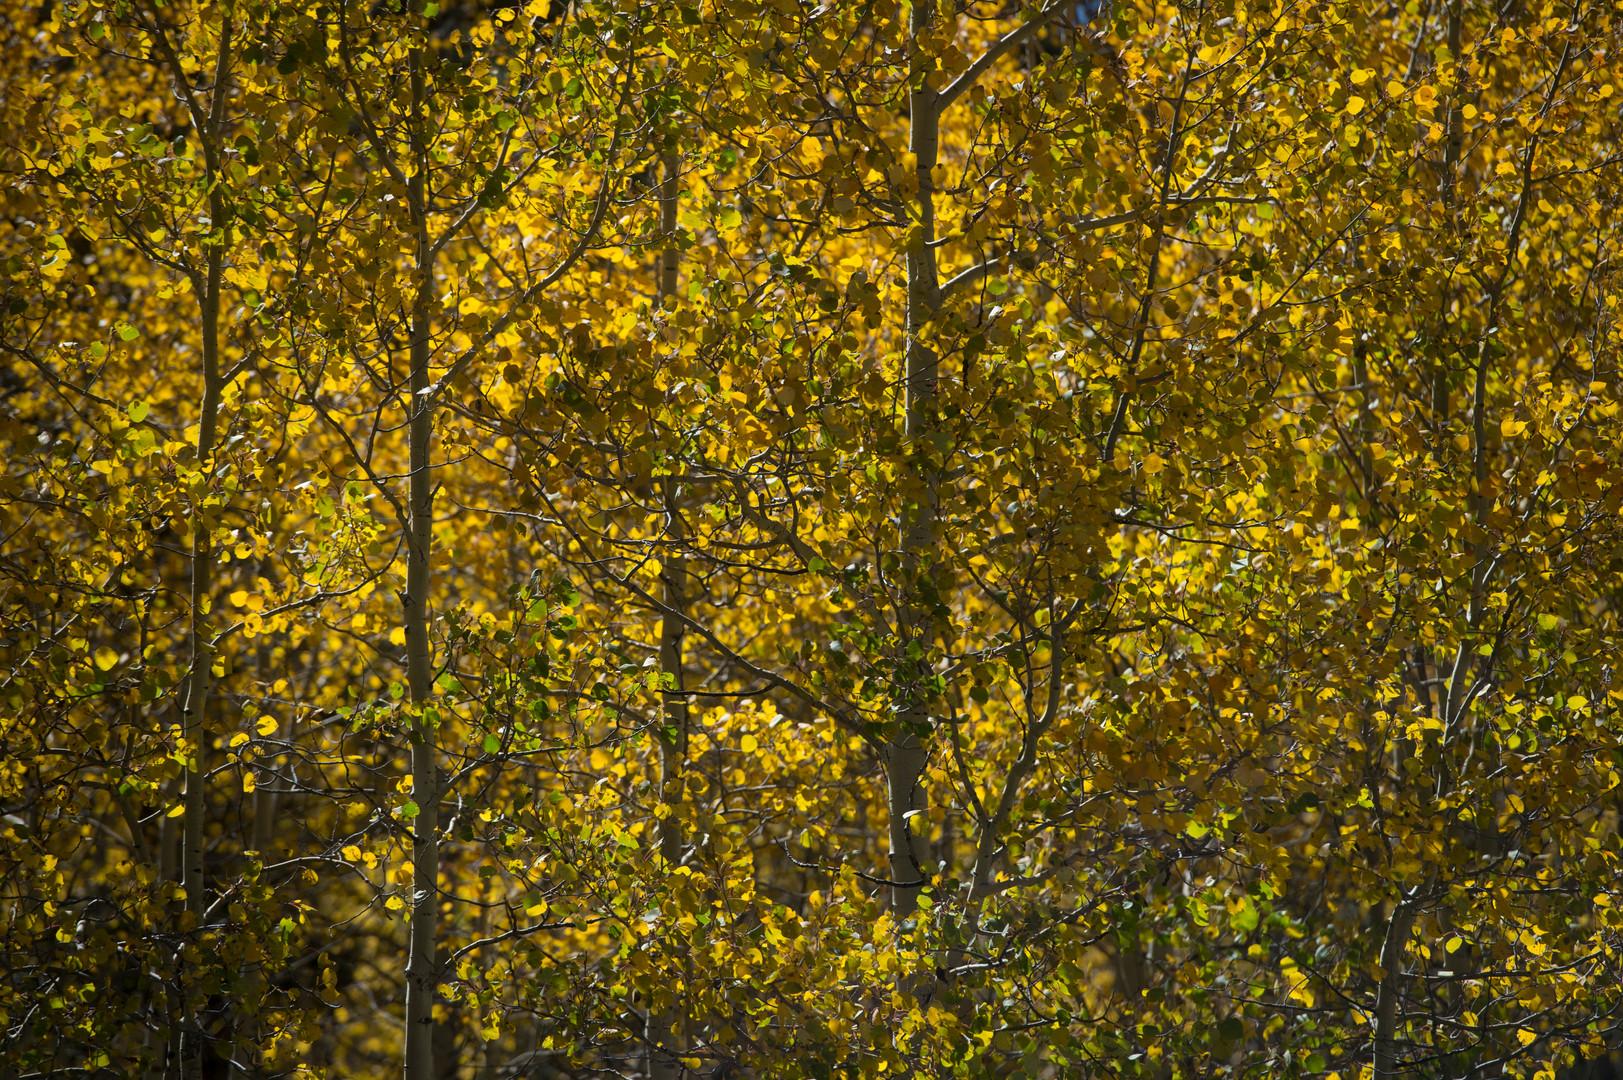 Aspen trees show off their fall colors near Kenosha Pass on Thursday, September 21, 2017.